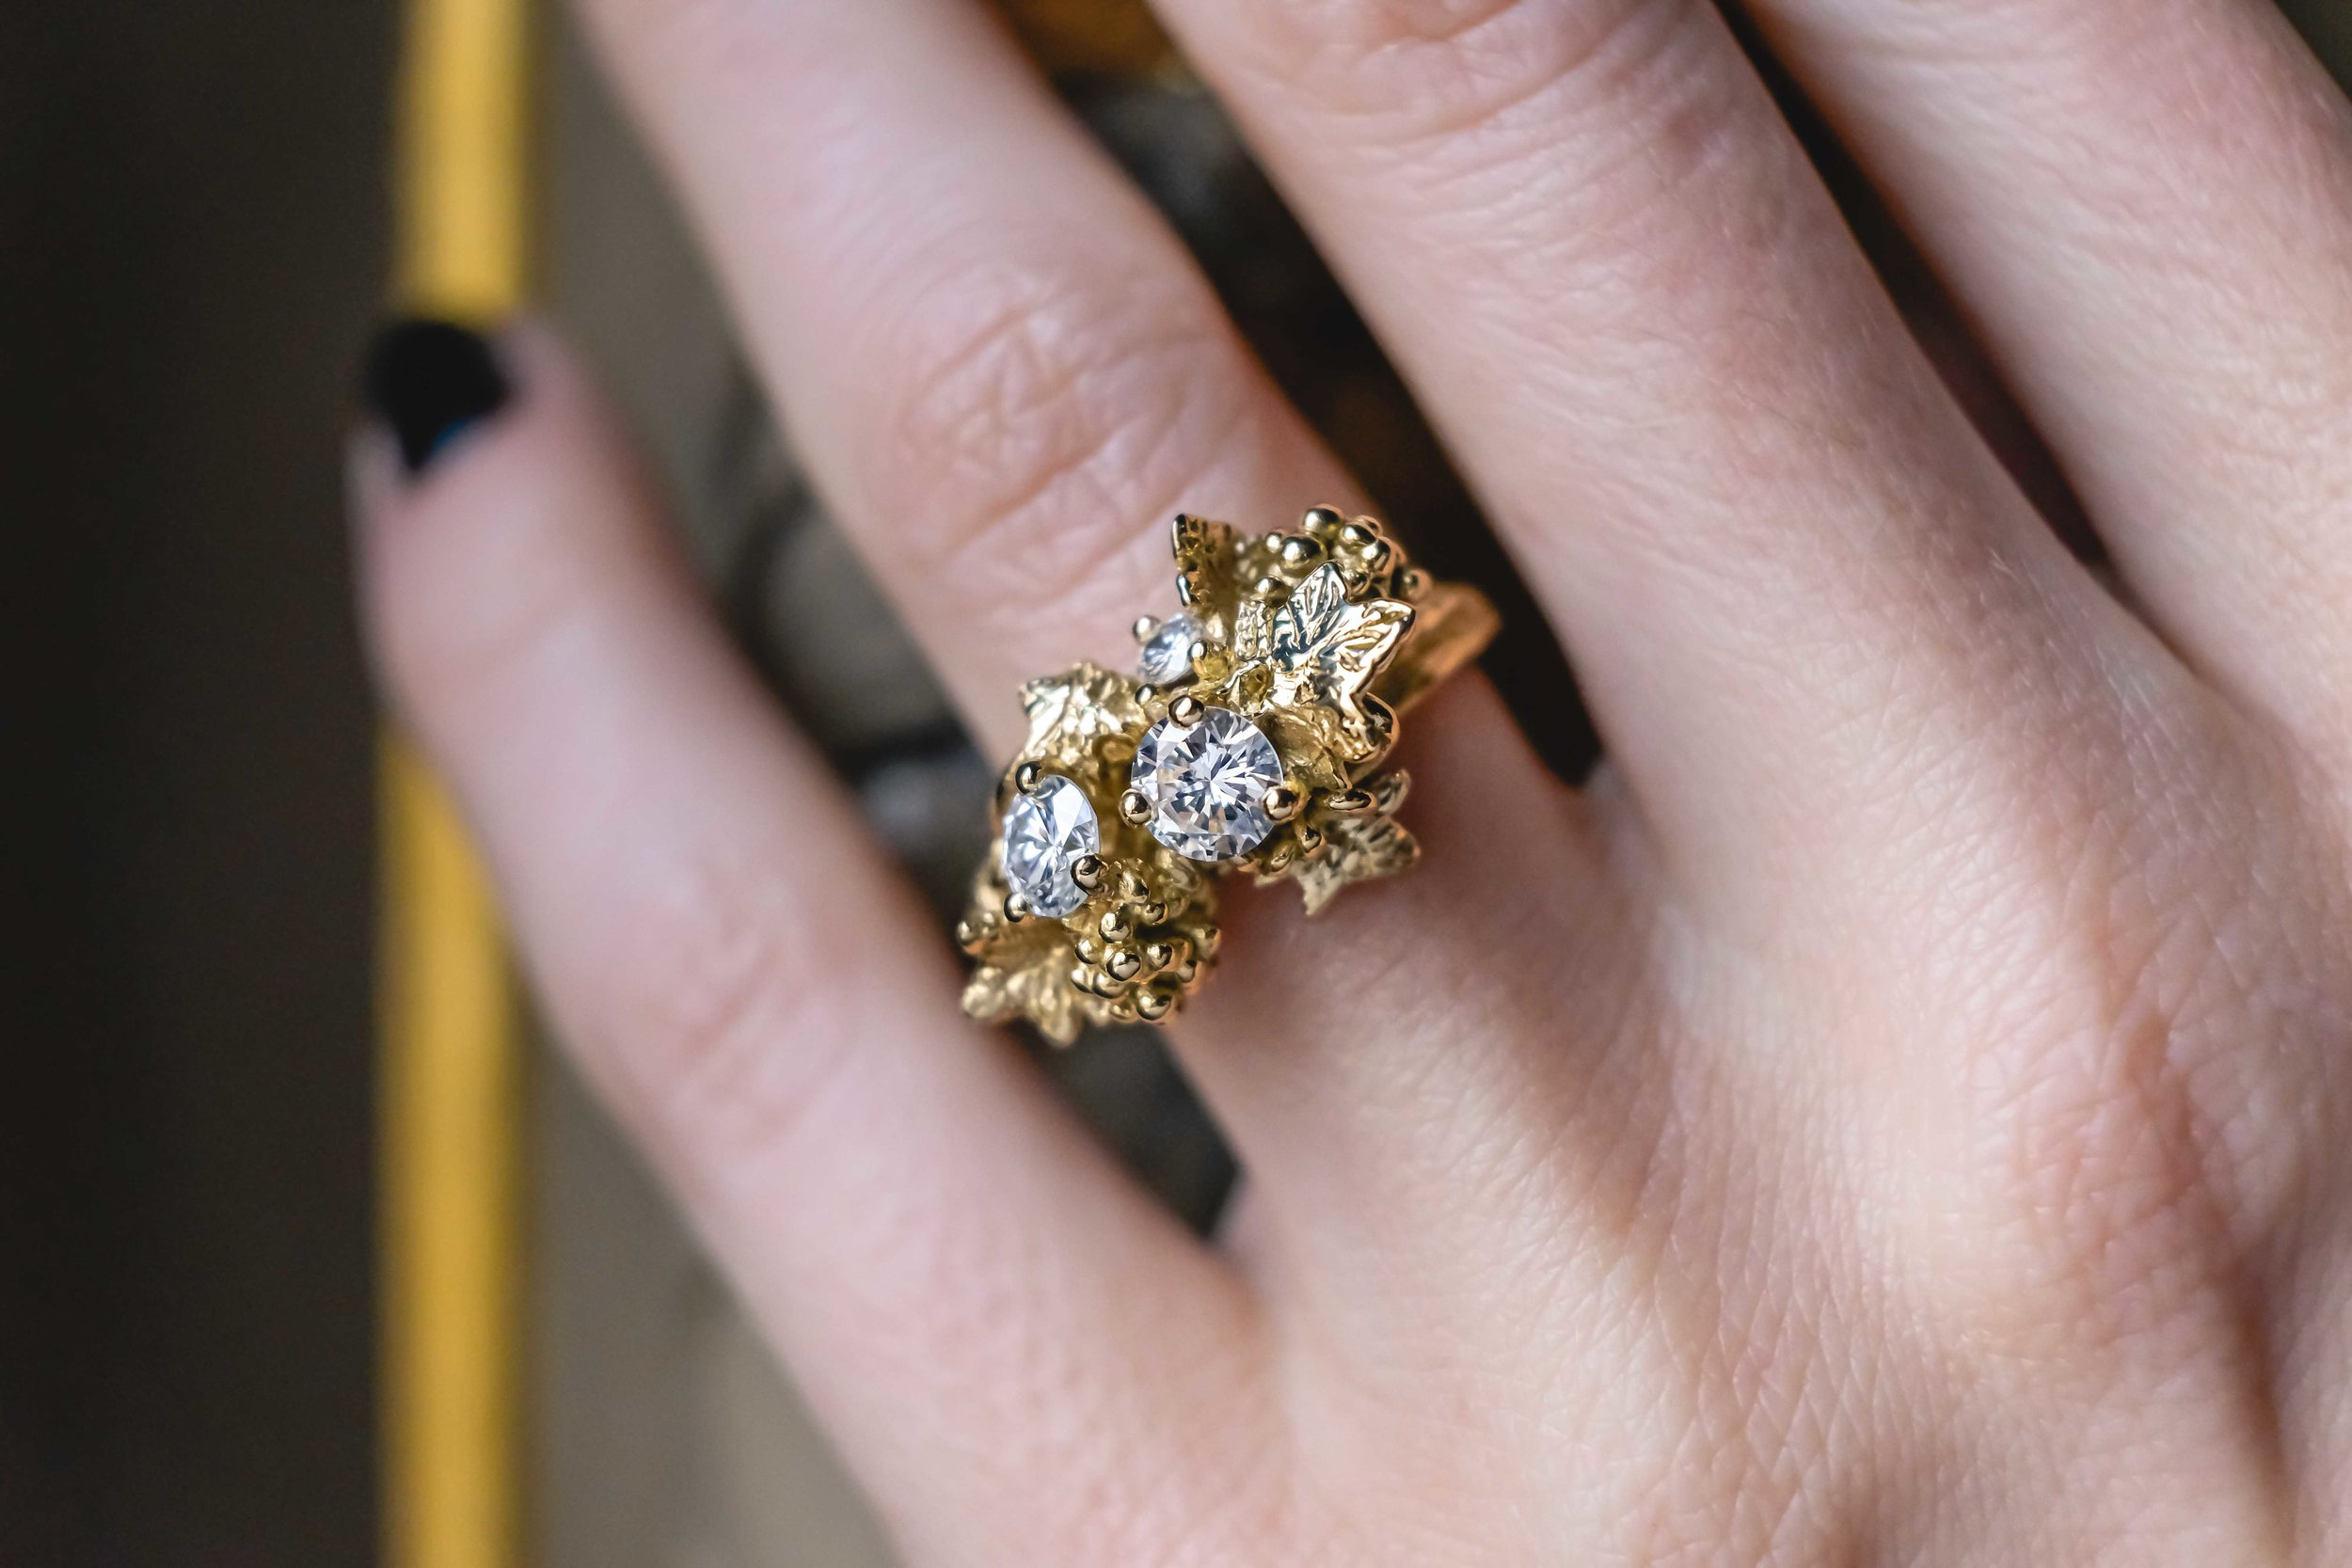 black-alchemy-ring-gold-diamonds-vitis-3-2.jpg